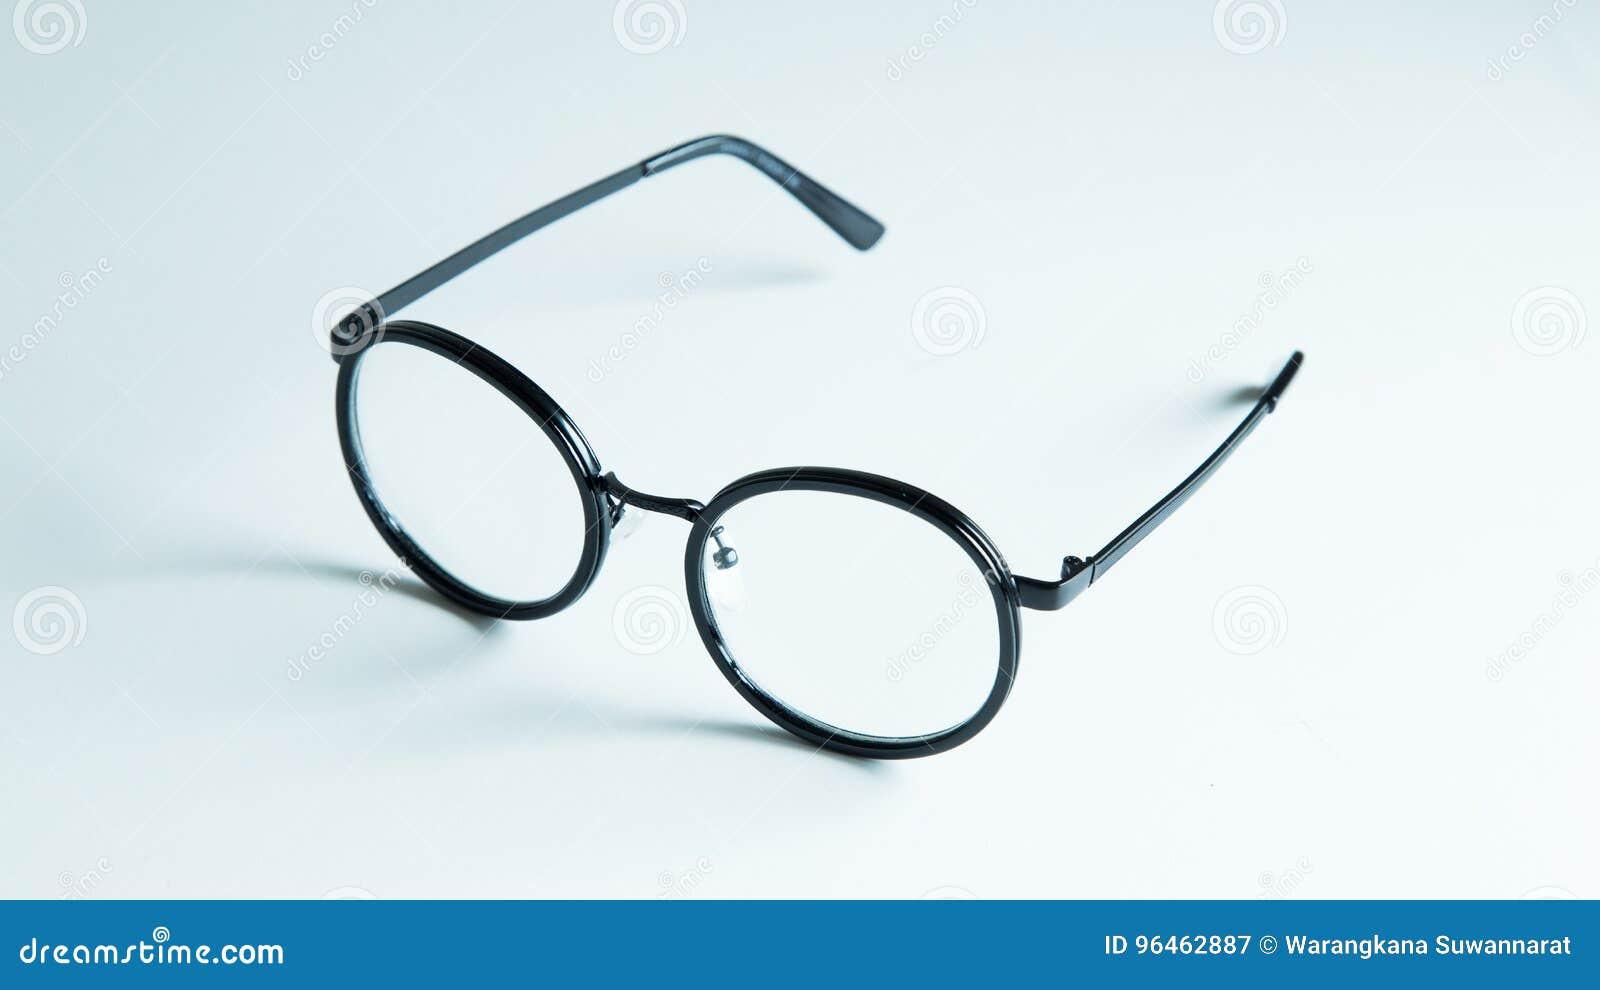 Classic Black Eye Glasses Isolated On White Background Stock